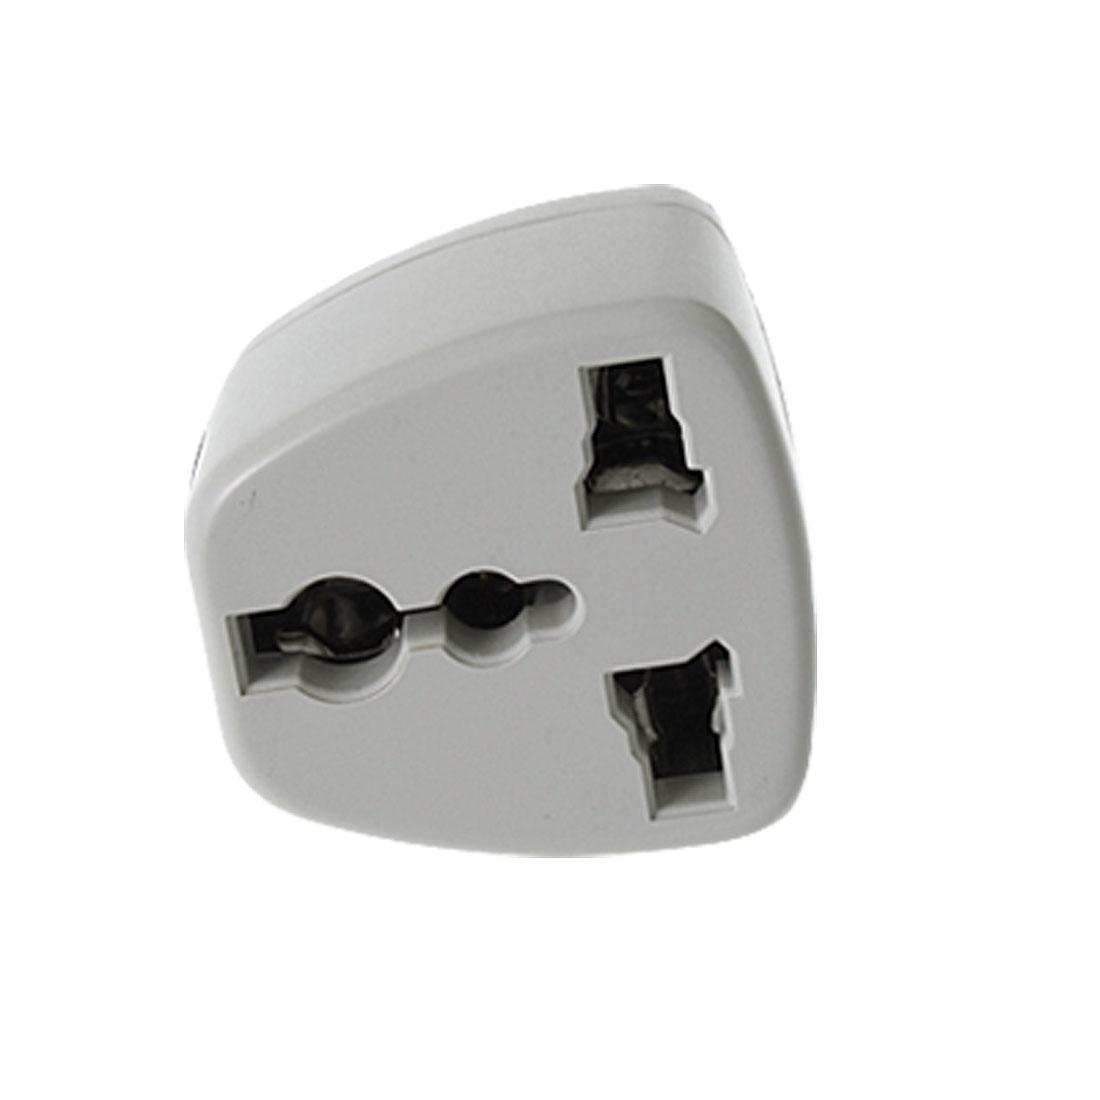 US Plug to AU UK Universal Socket 250V Mini Adapter Converter